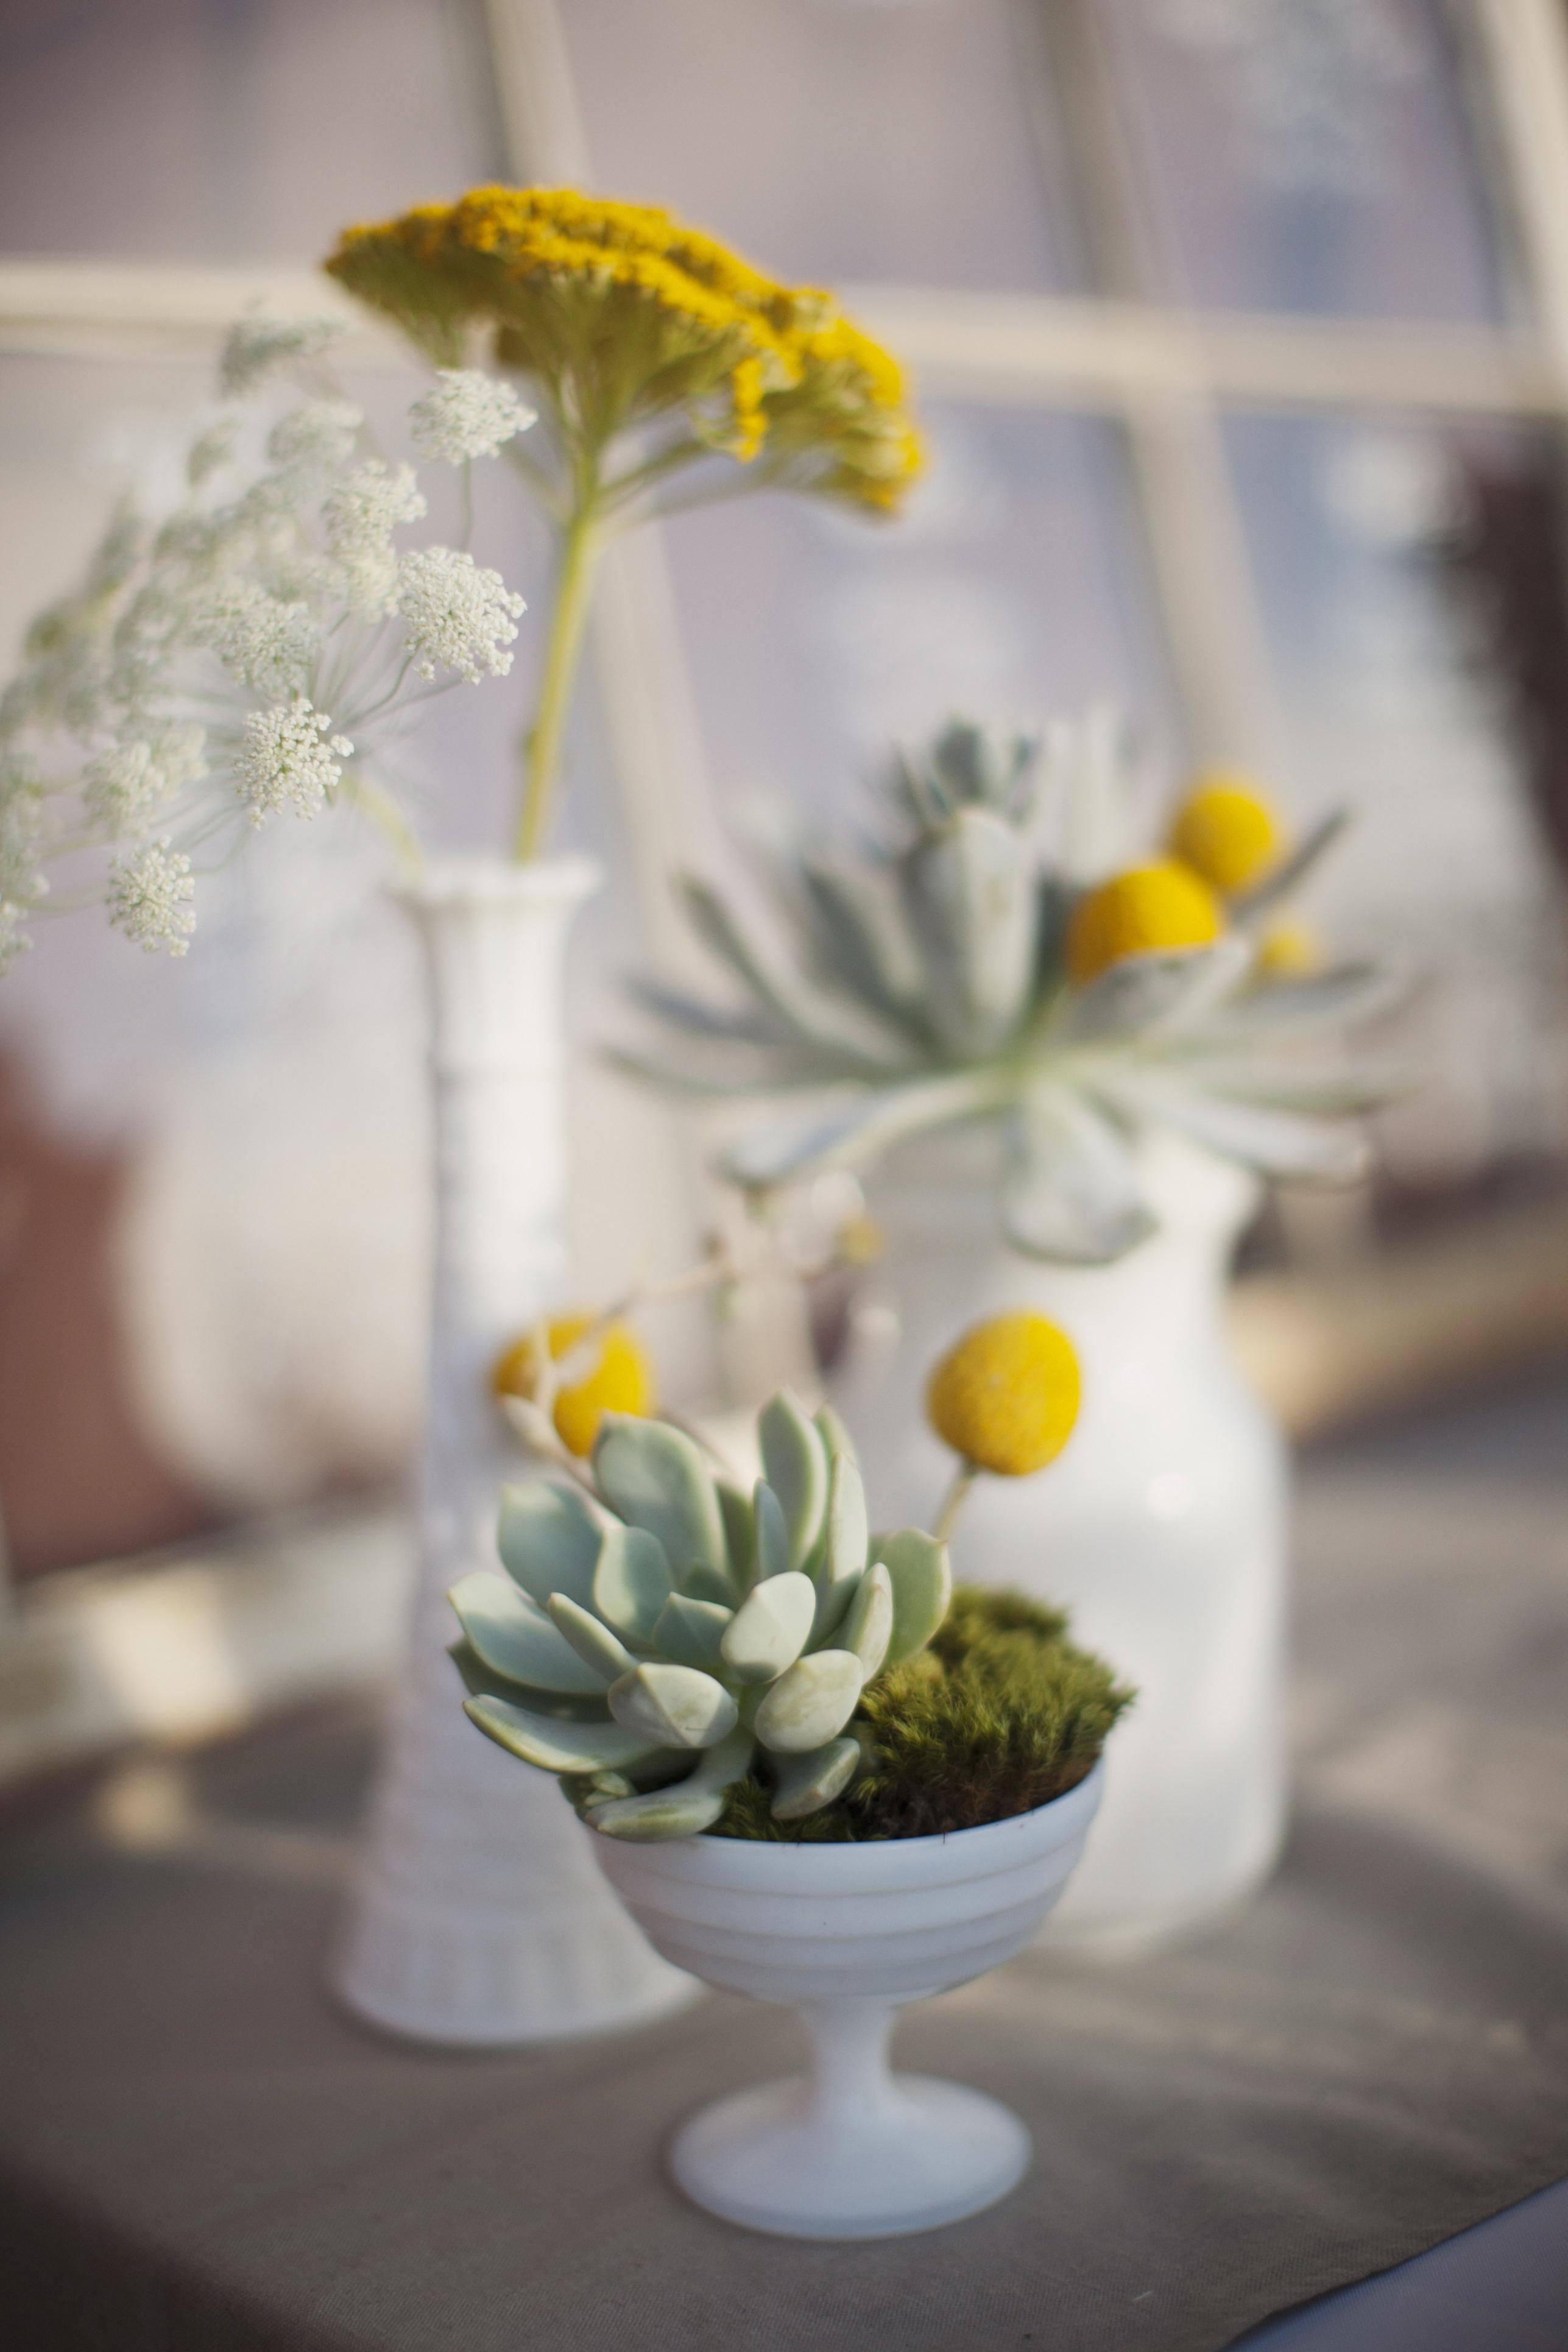 Flowers & Decor, Decor, white, yellow, Vases, Billy, Balls, Andrea eric